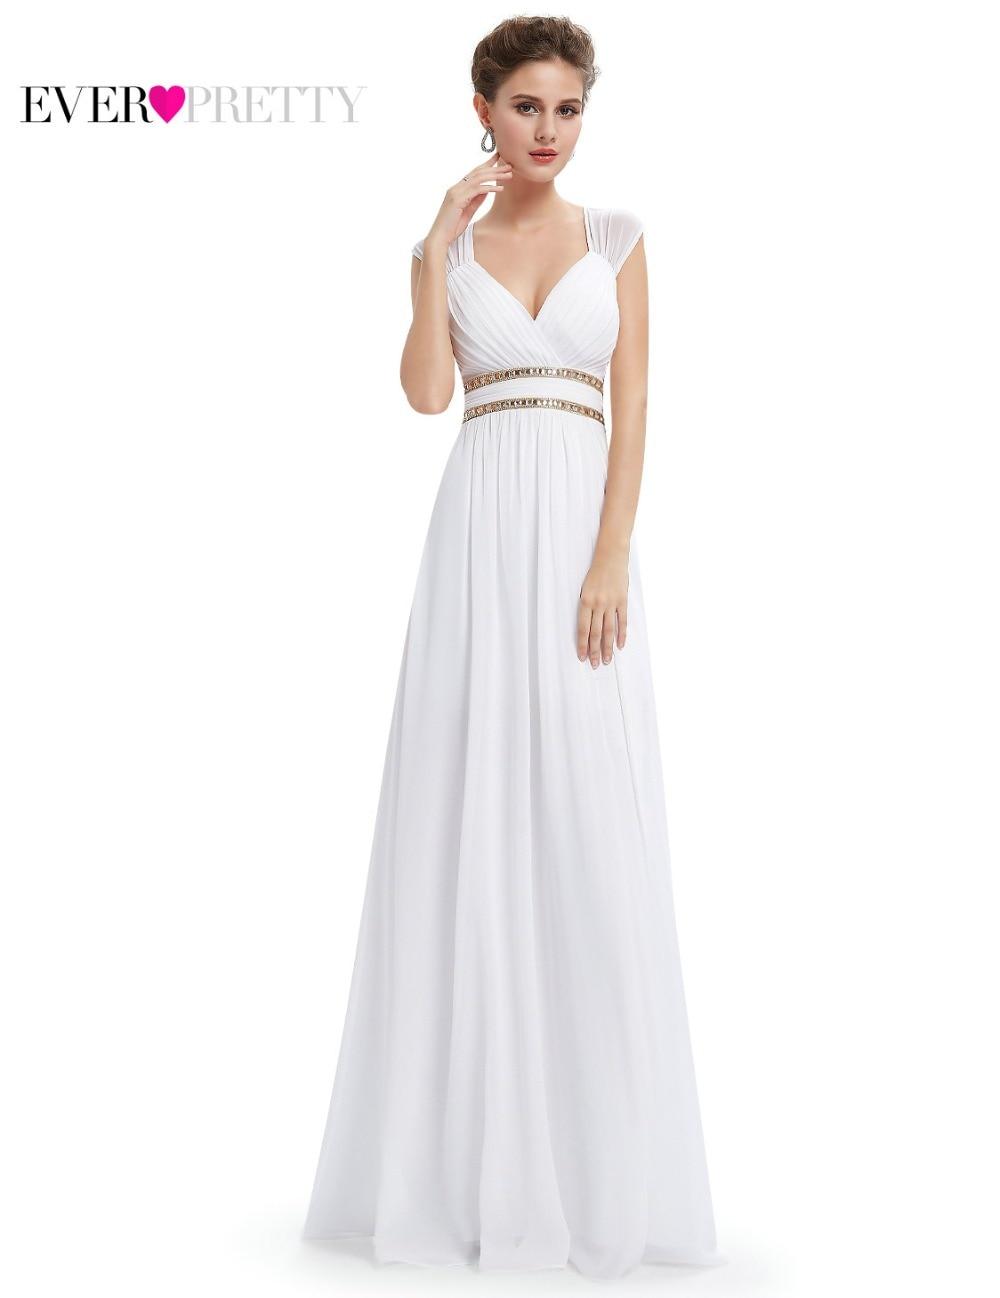 Mermaid Elegant Long Prom Dresses Ever Pretty HE08758BK 2016 O neck ...